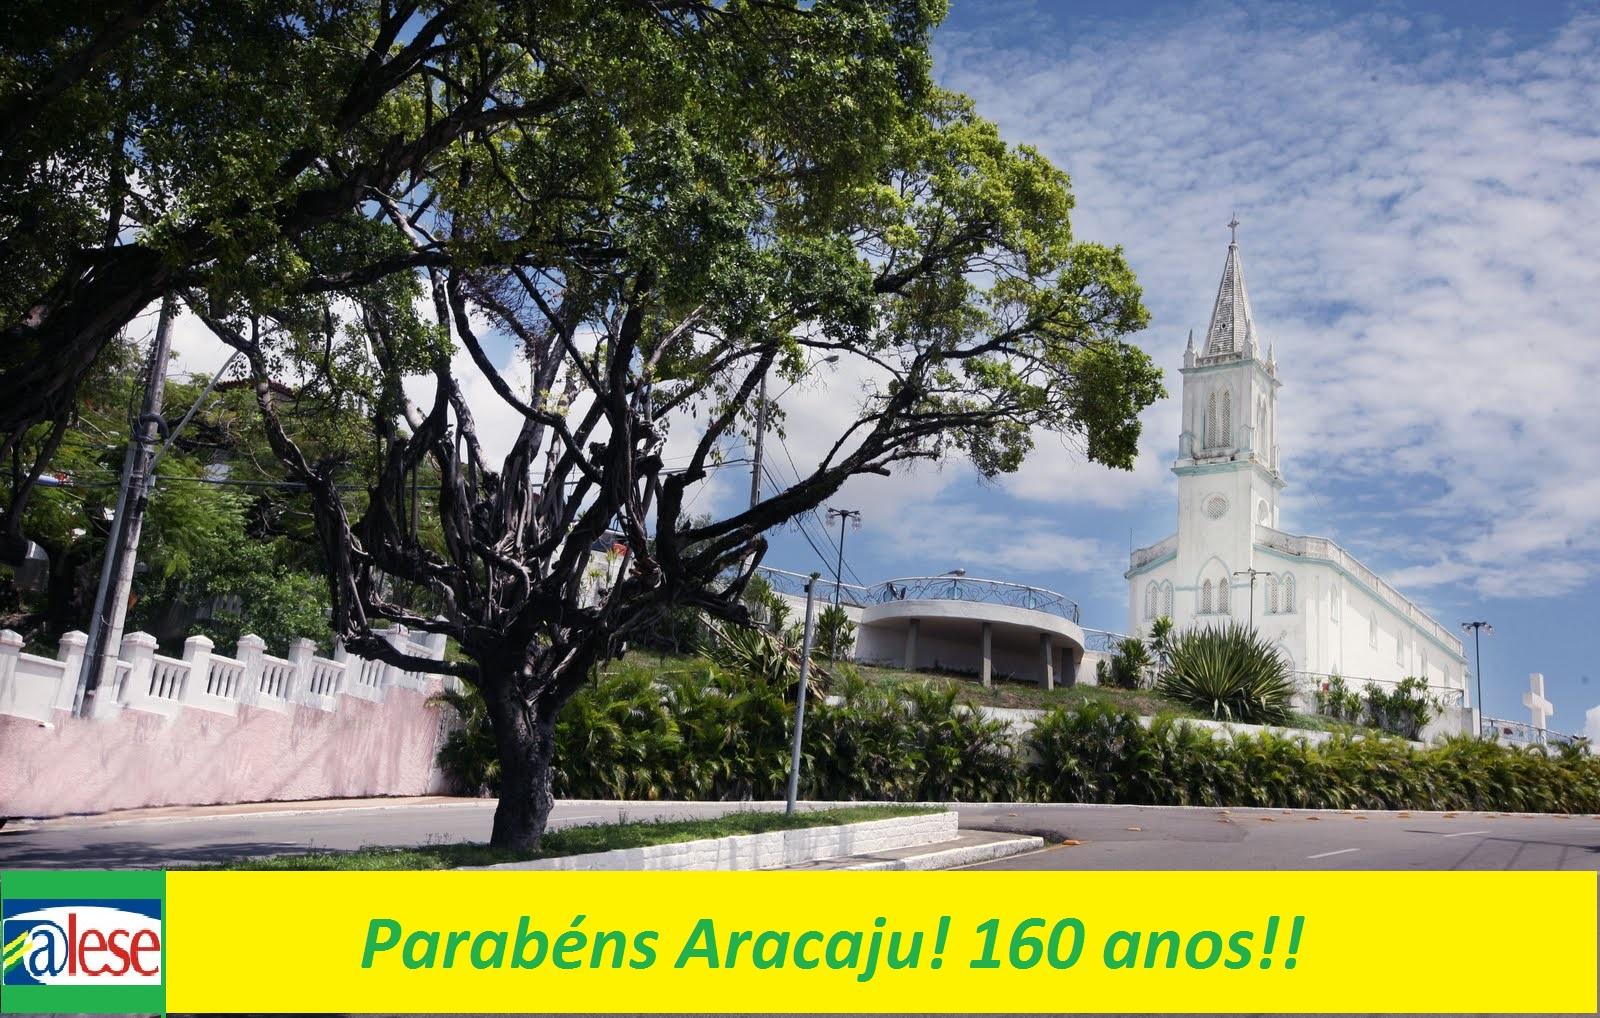 Assembleia Legislativa de Sergipe dar os parabéns a Aracaju